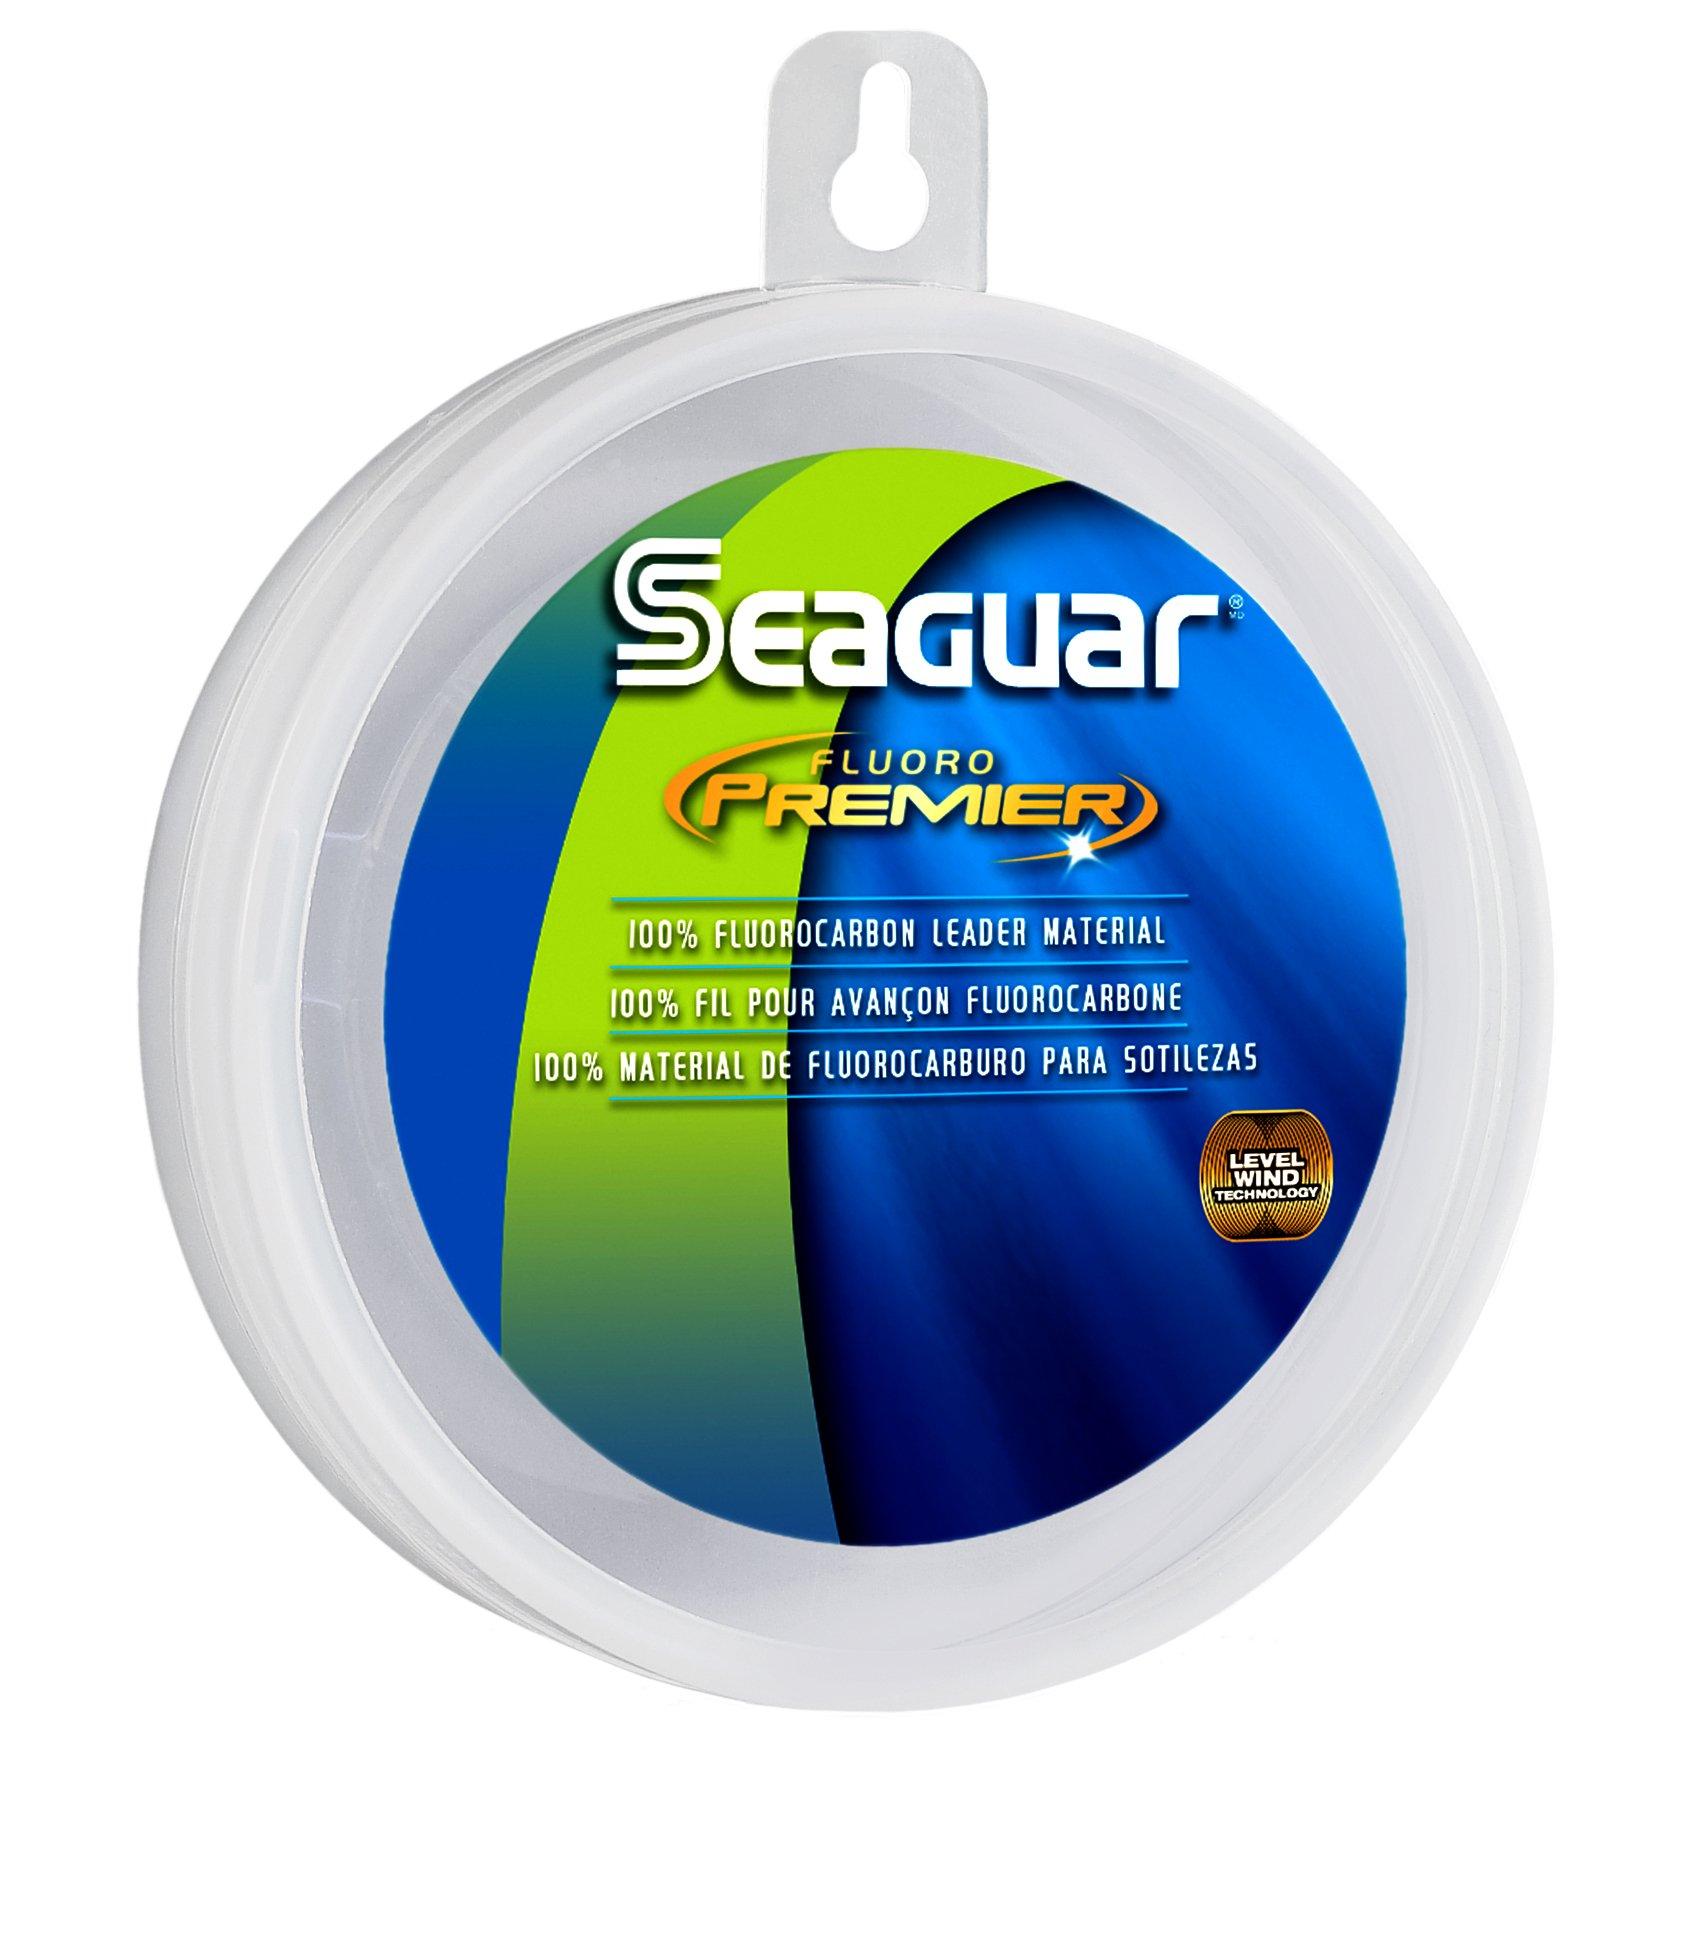 Seaguar 20FP50 Fluorocarbon Premier Leader Material, 20-Pound, 50-Yards